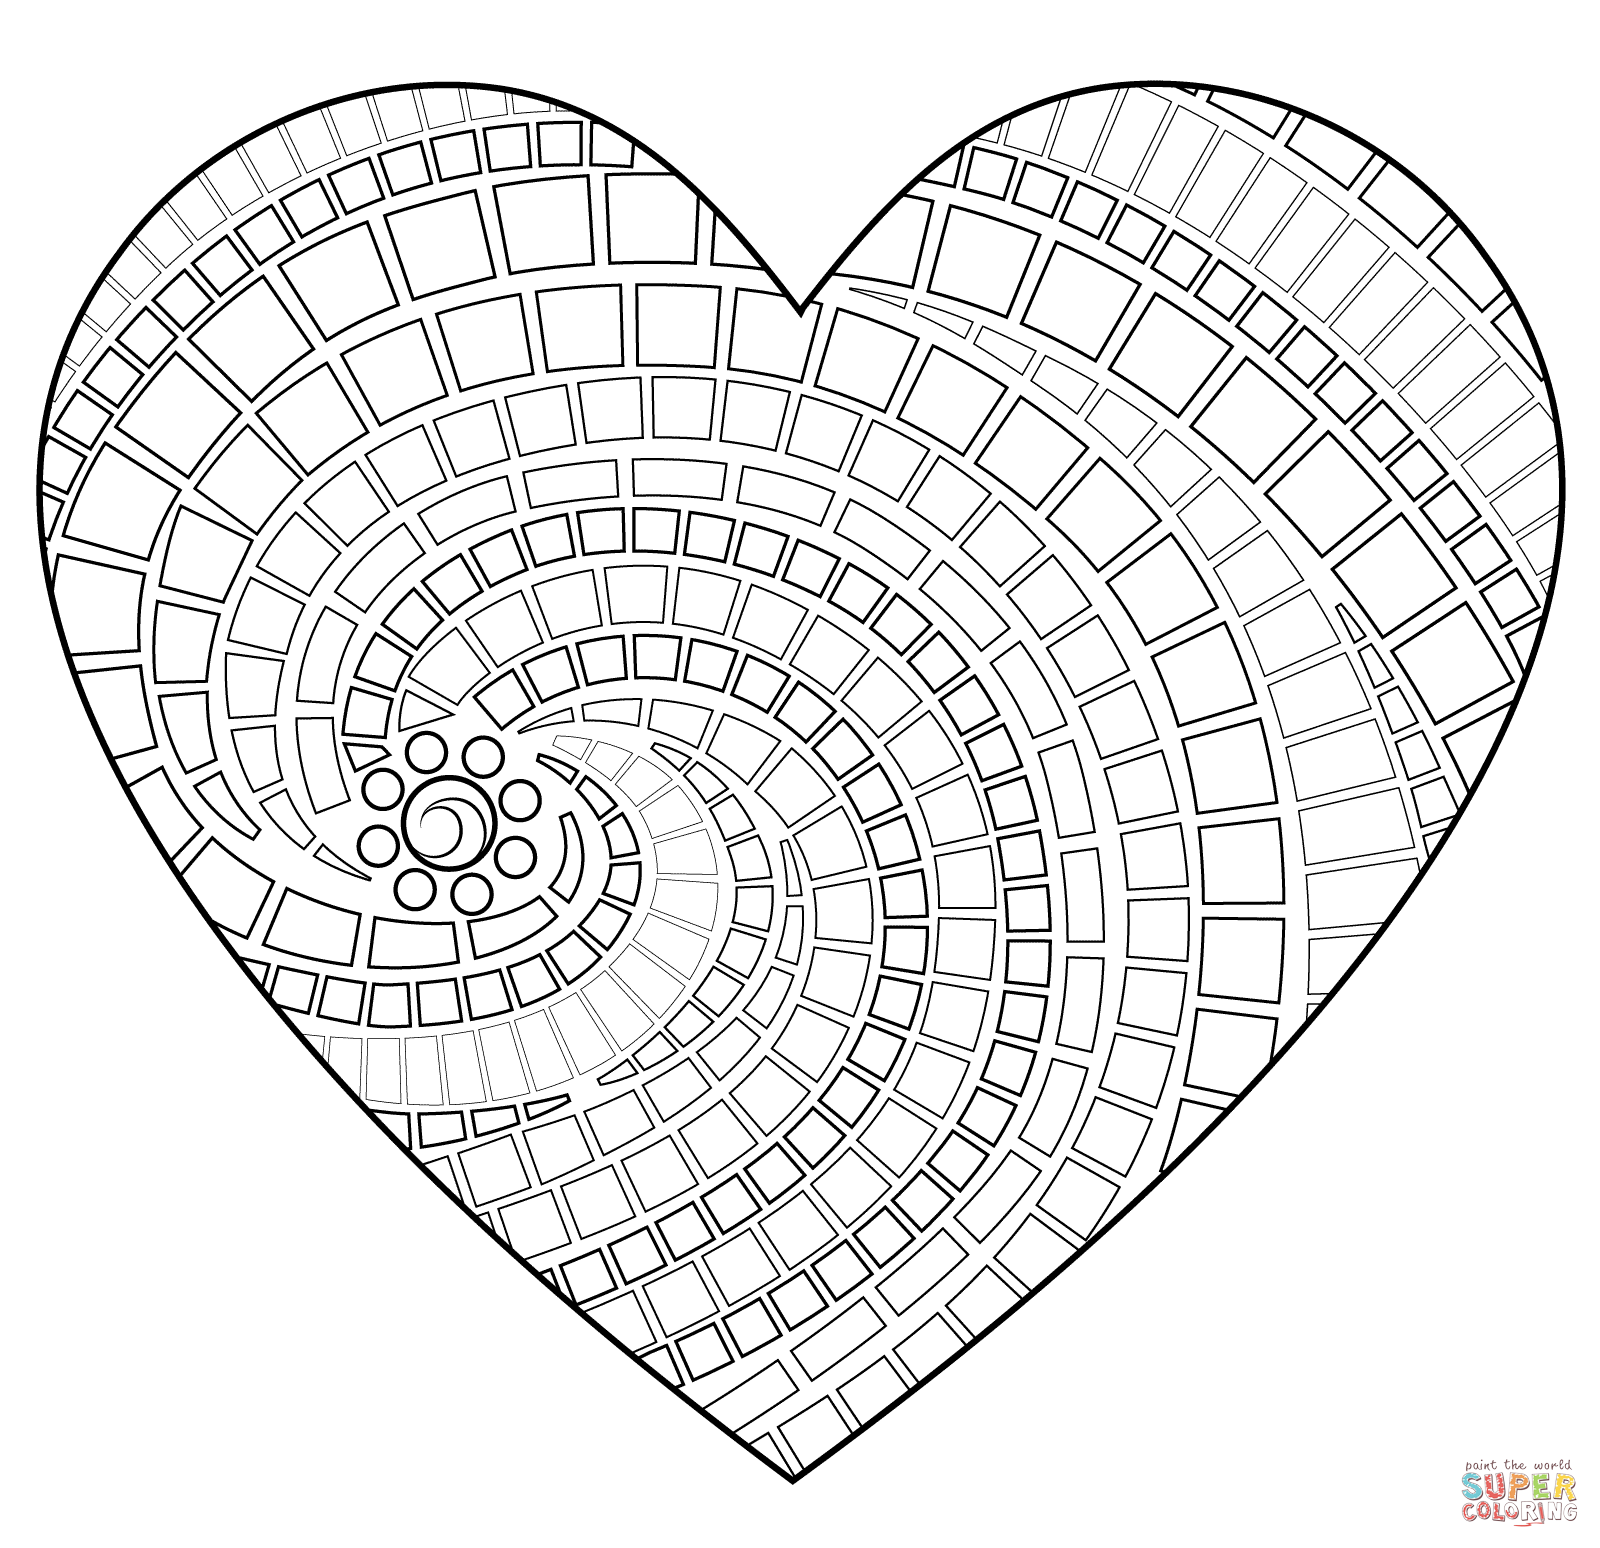 free mosaic patterns to color mosaic patterns printable mosaic patterns coloring pages mosaic color free patterns to